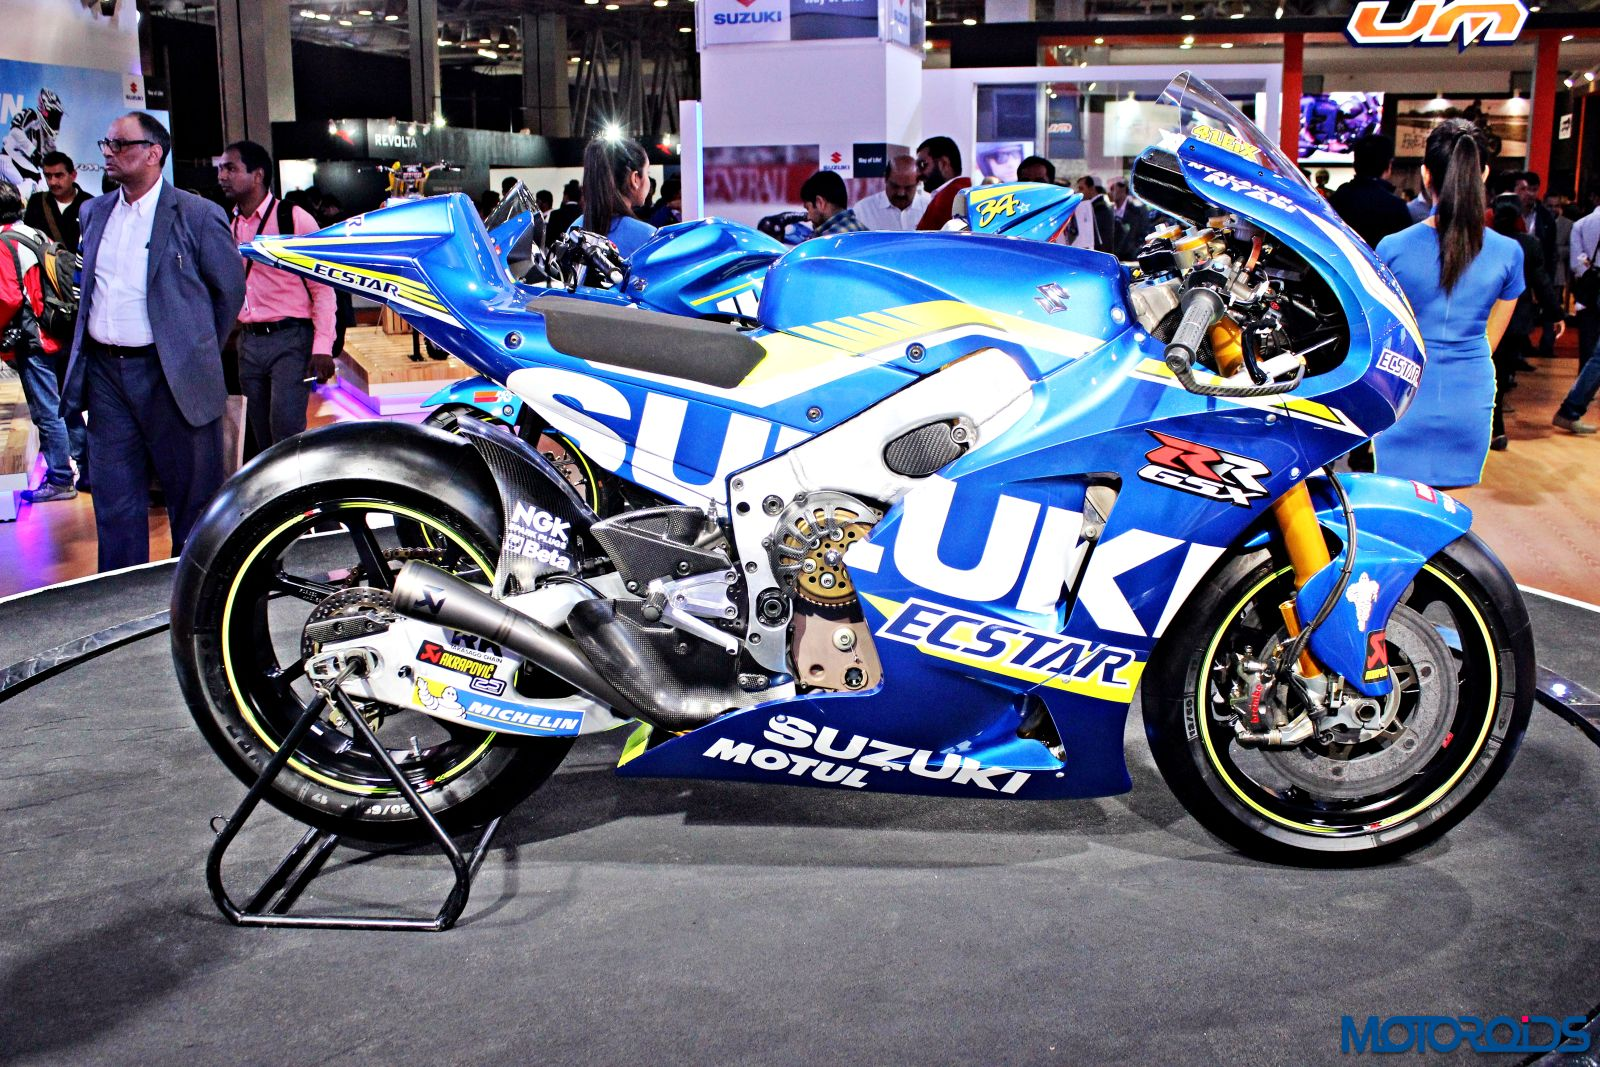 Suzuki ECSTAR GSX-RR - MotoGP Motorcycle - Auto Expo 2016 (2)